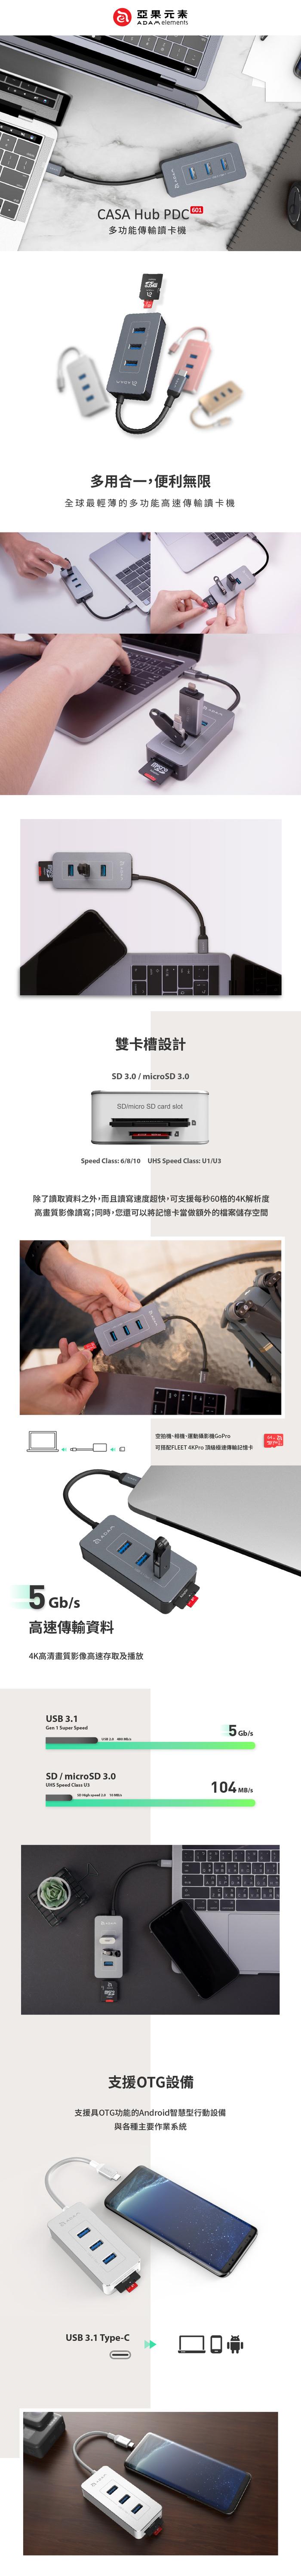 ADAM|Hub PDC601 六合一 80W多功能PD充電傳輸讀卡機